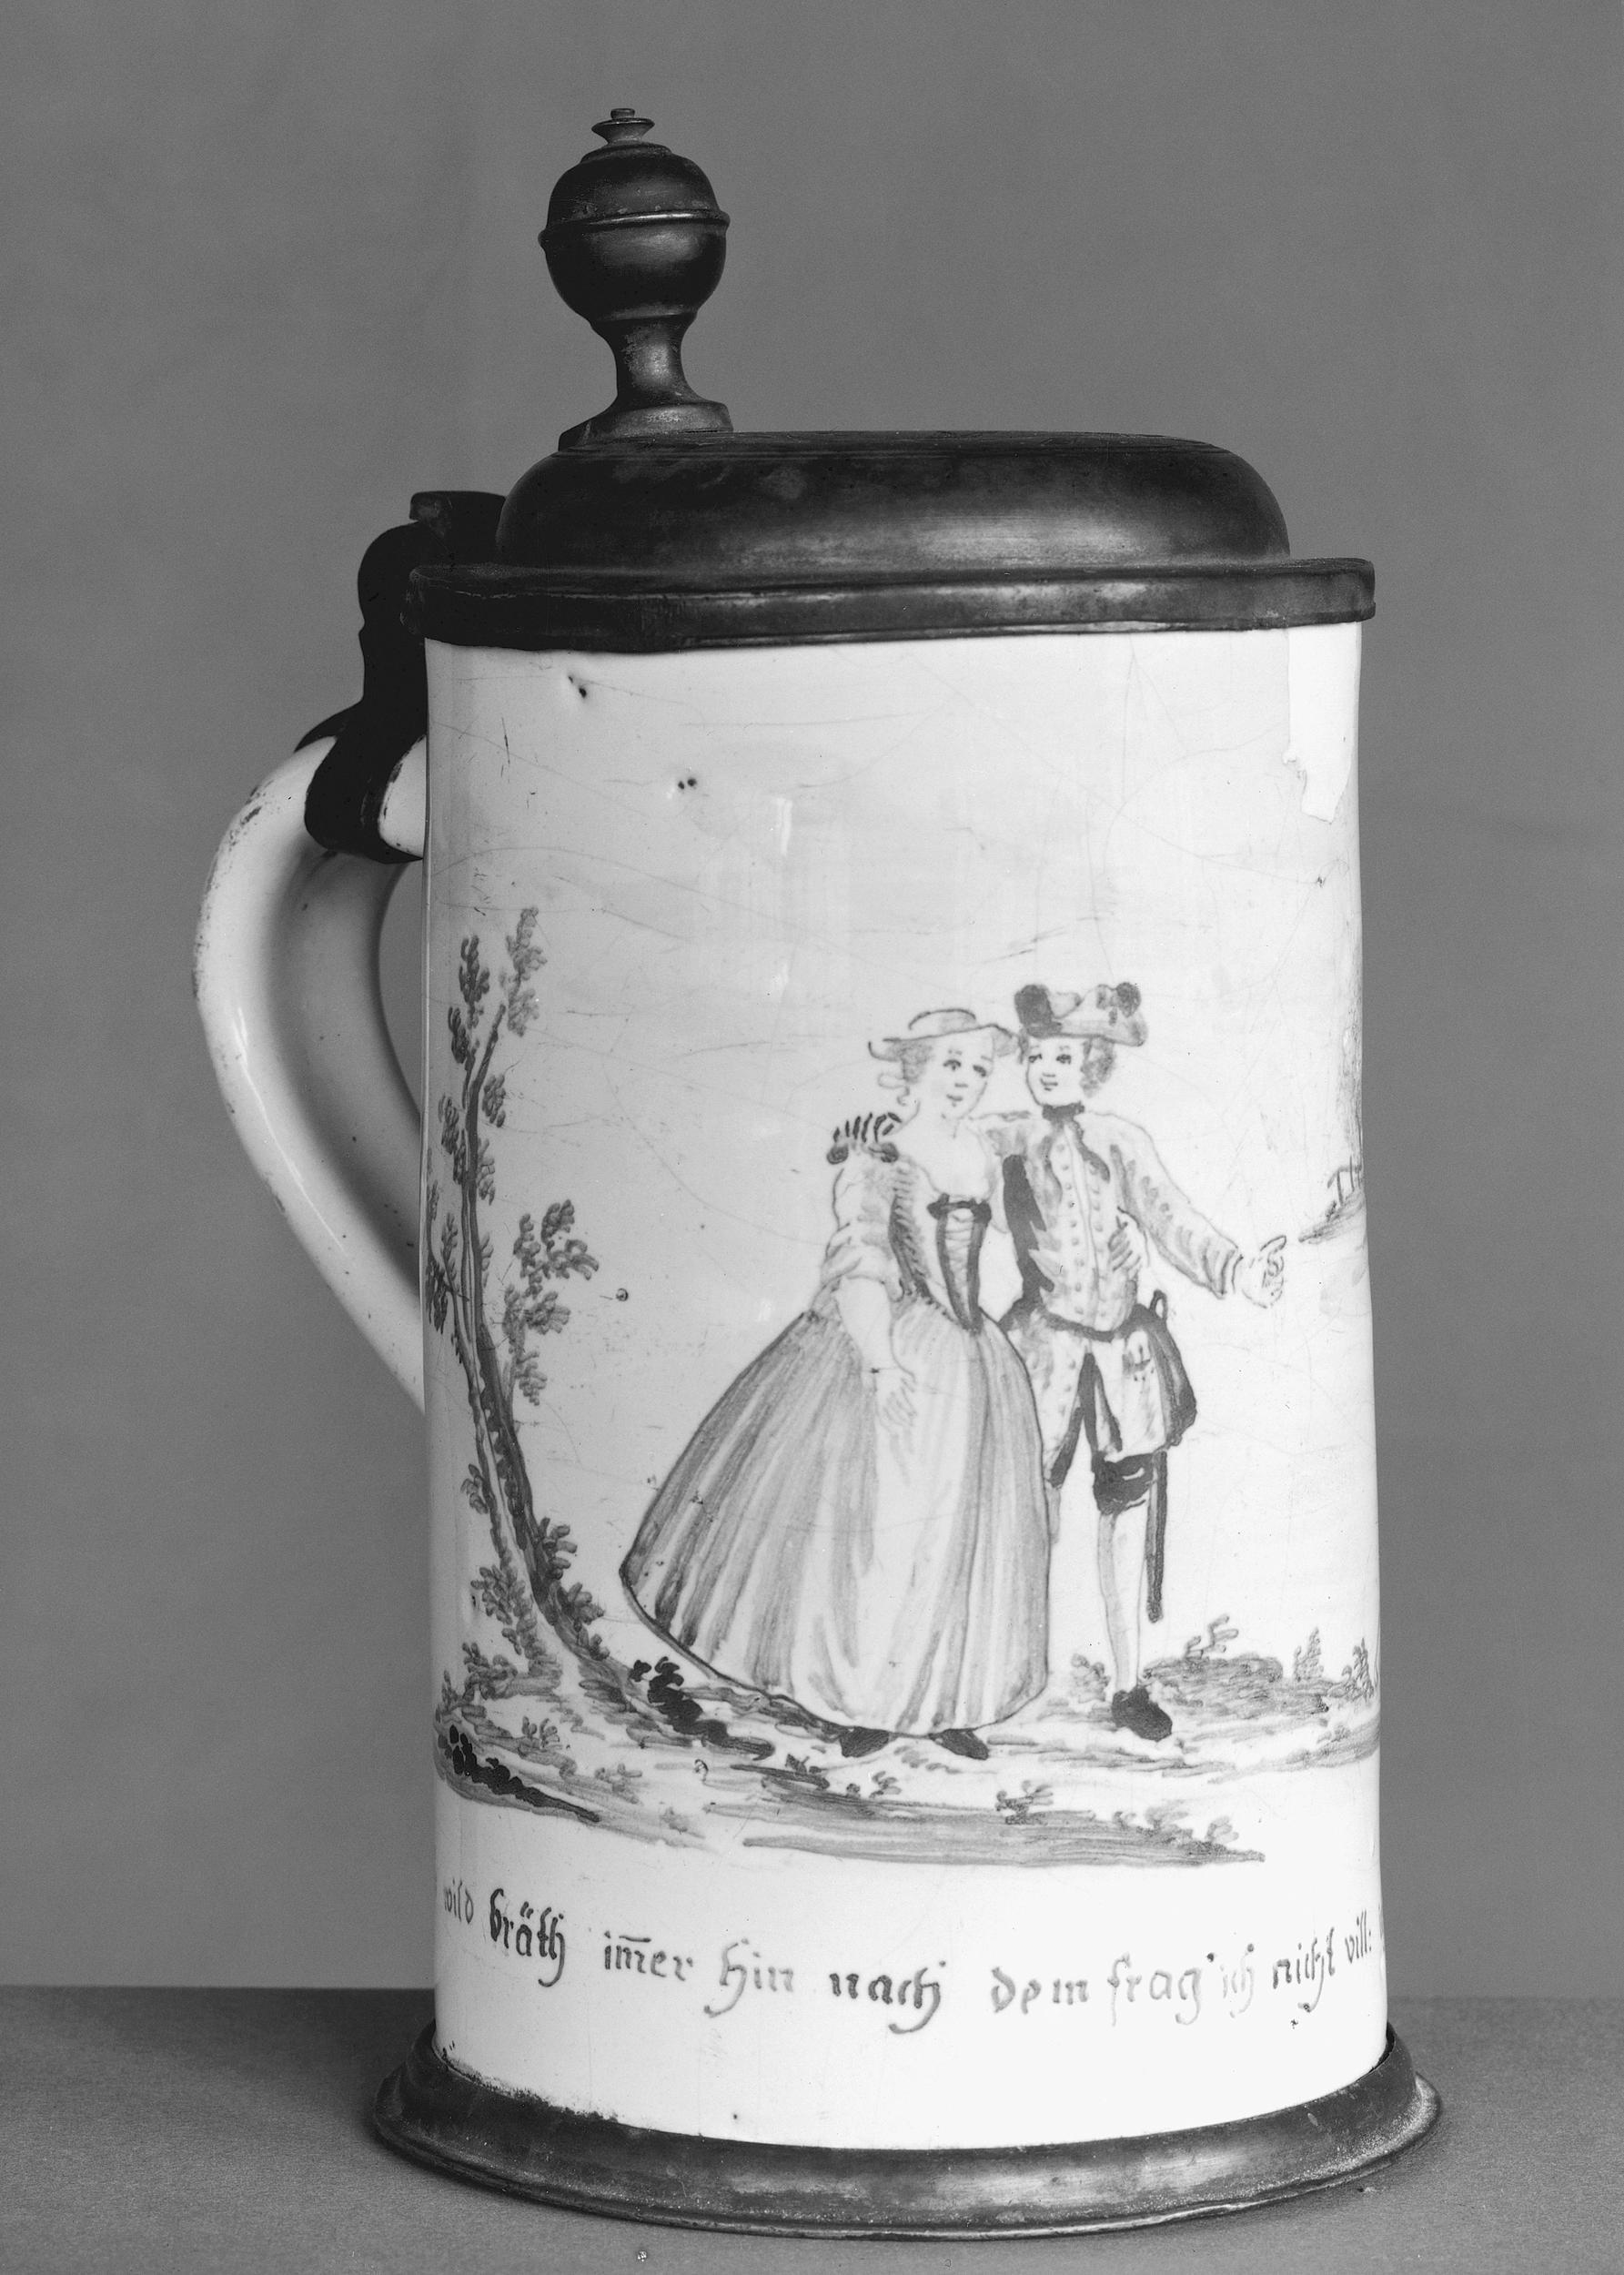 Tankard Friedberg 18. JH copyright Victoria Albert Museum